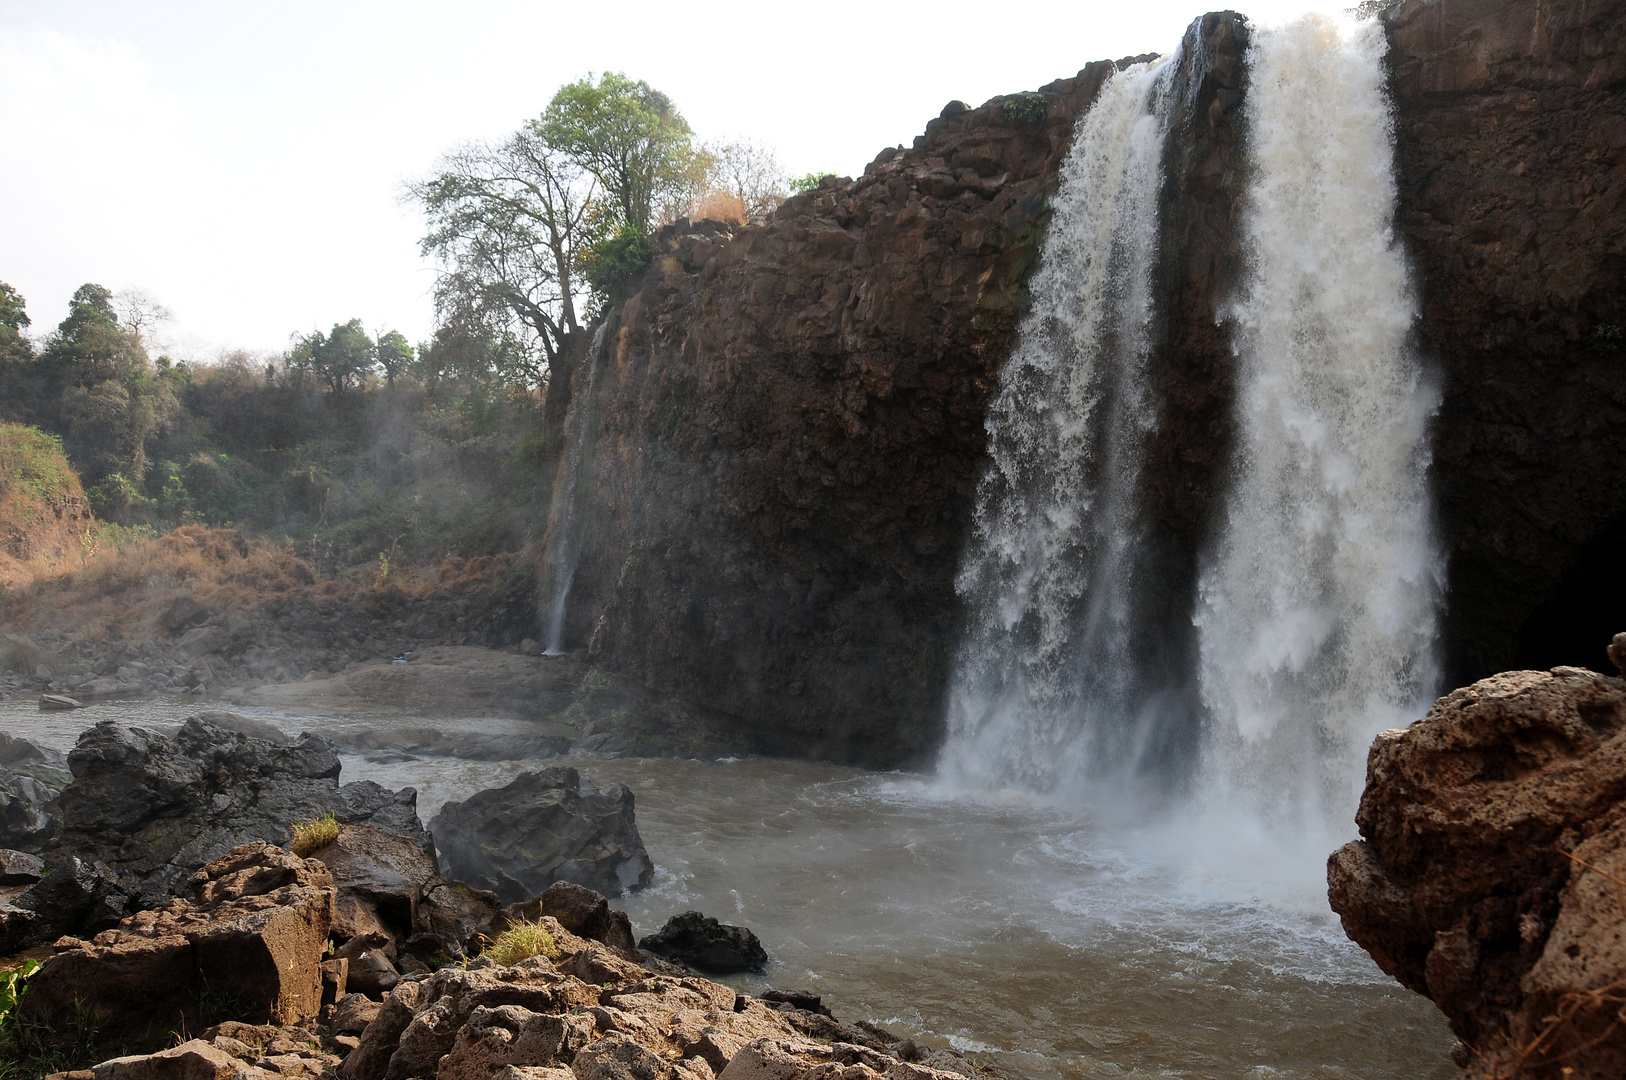 Tisissat-Wasserfall am Blauen Nil